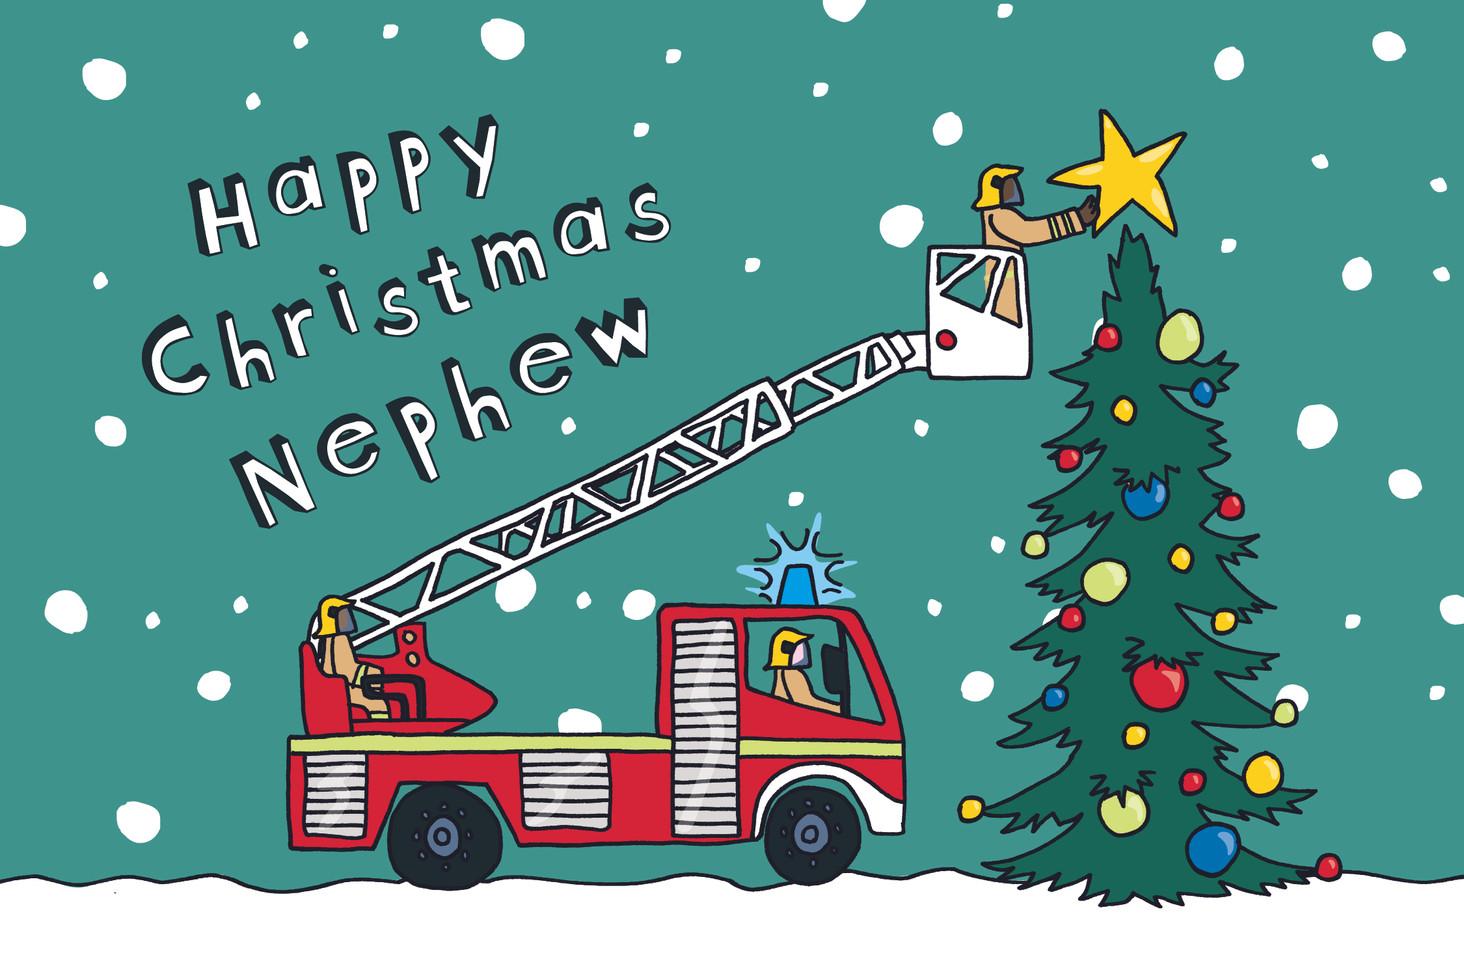 Christmas Fire Engine - Nephew